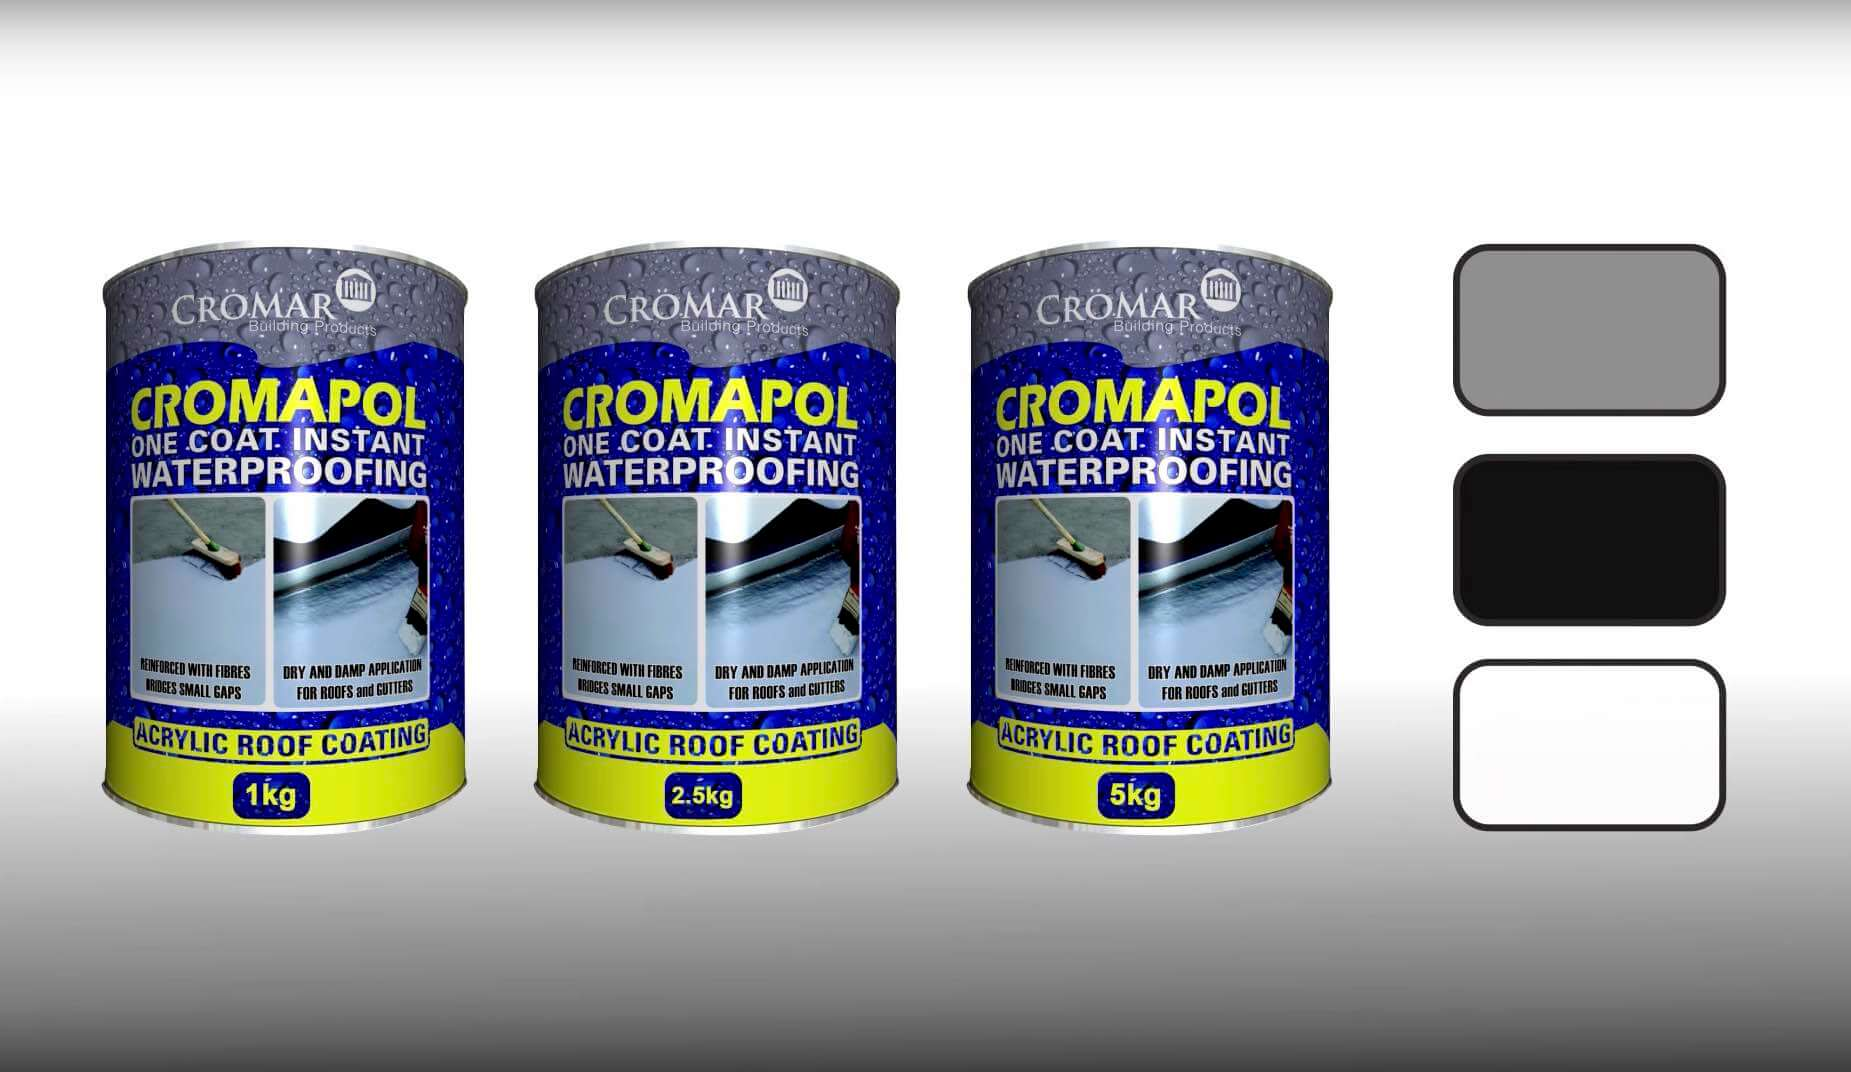 Cromapol hits the Australian market